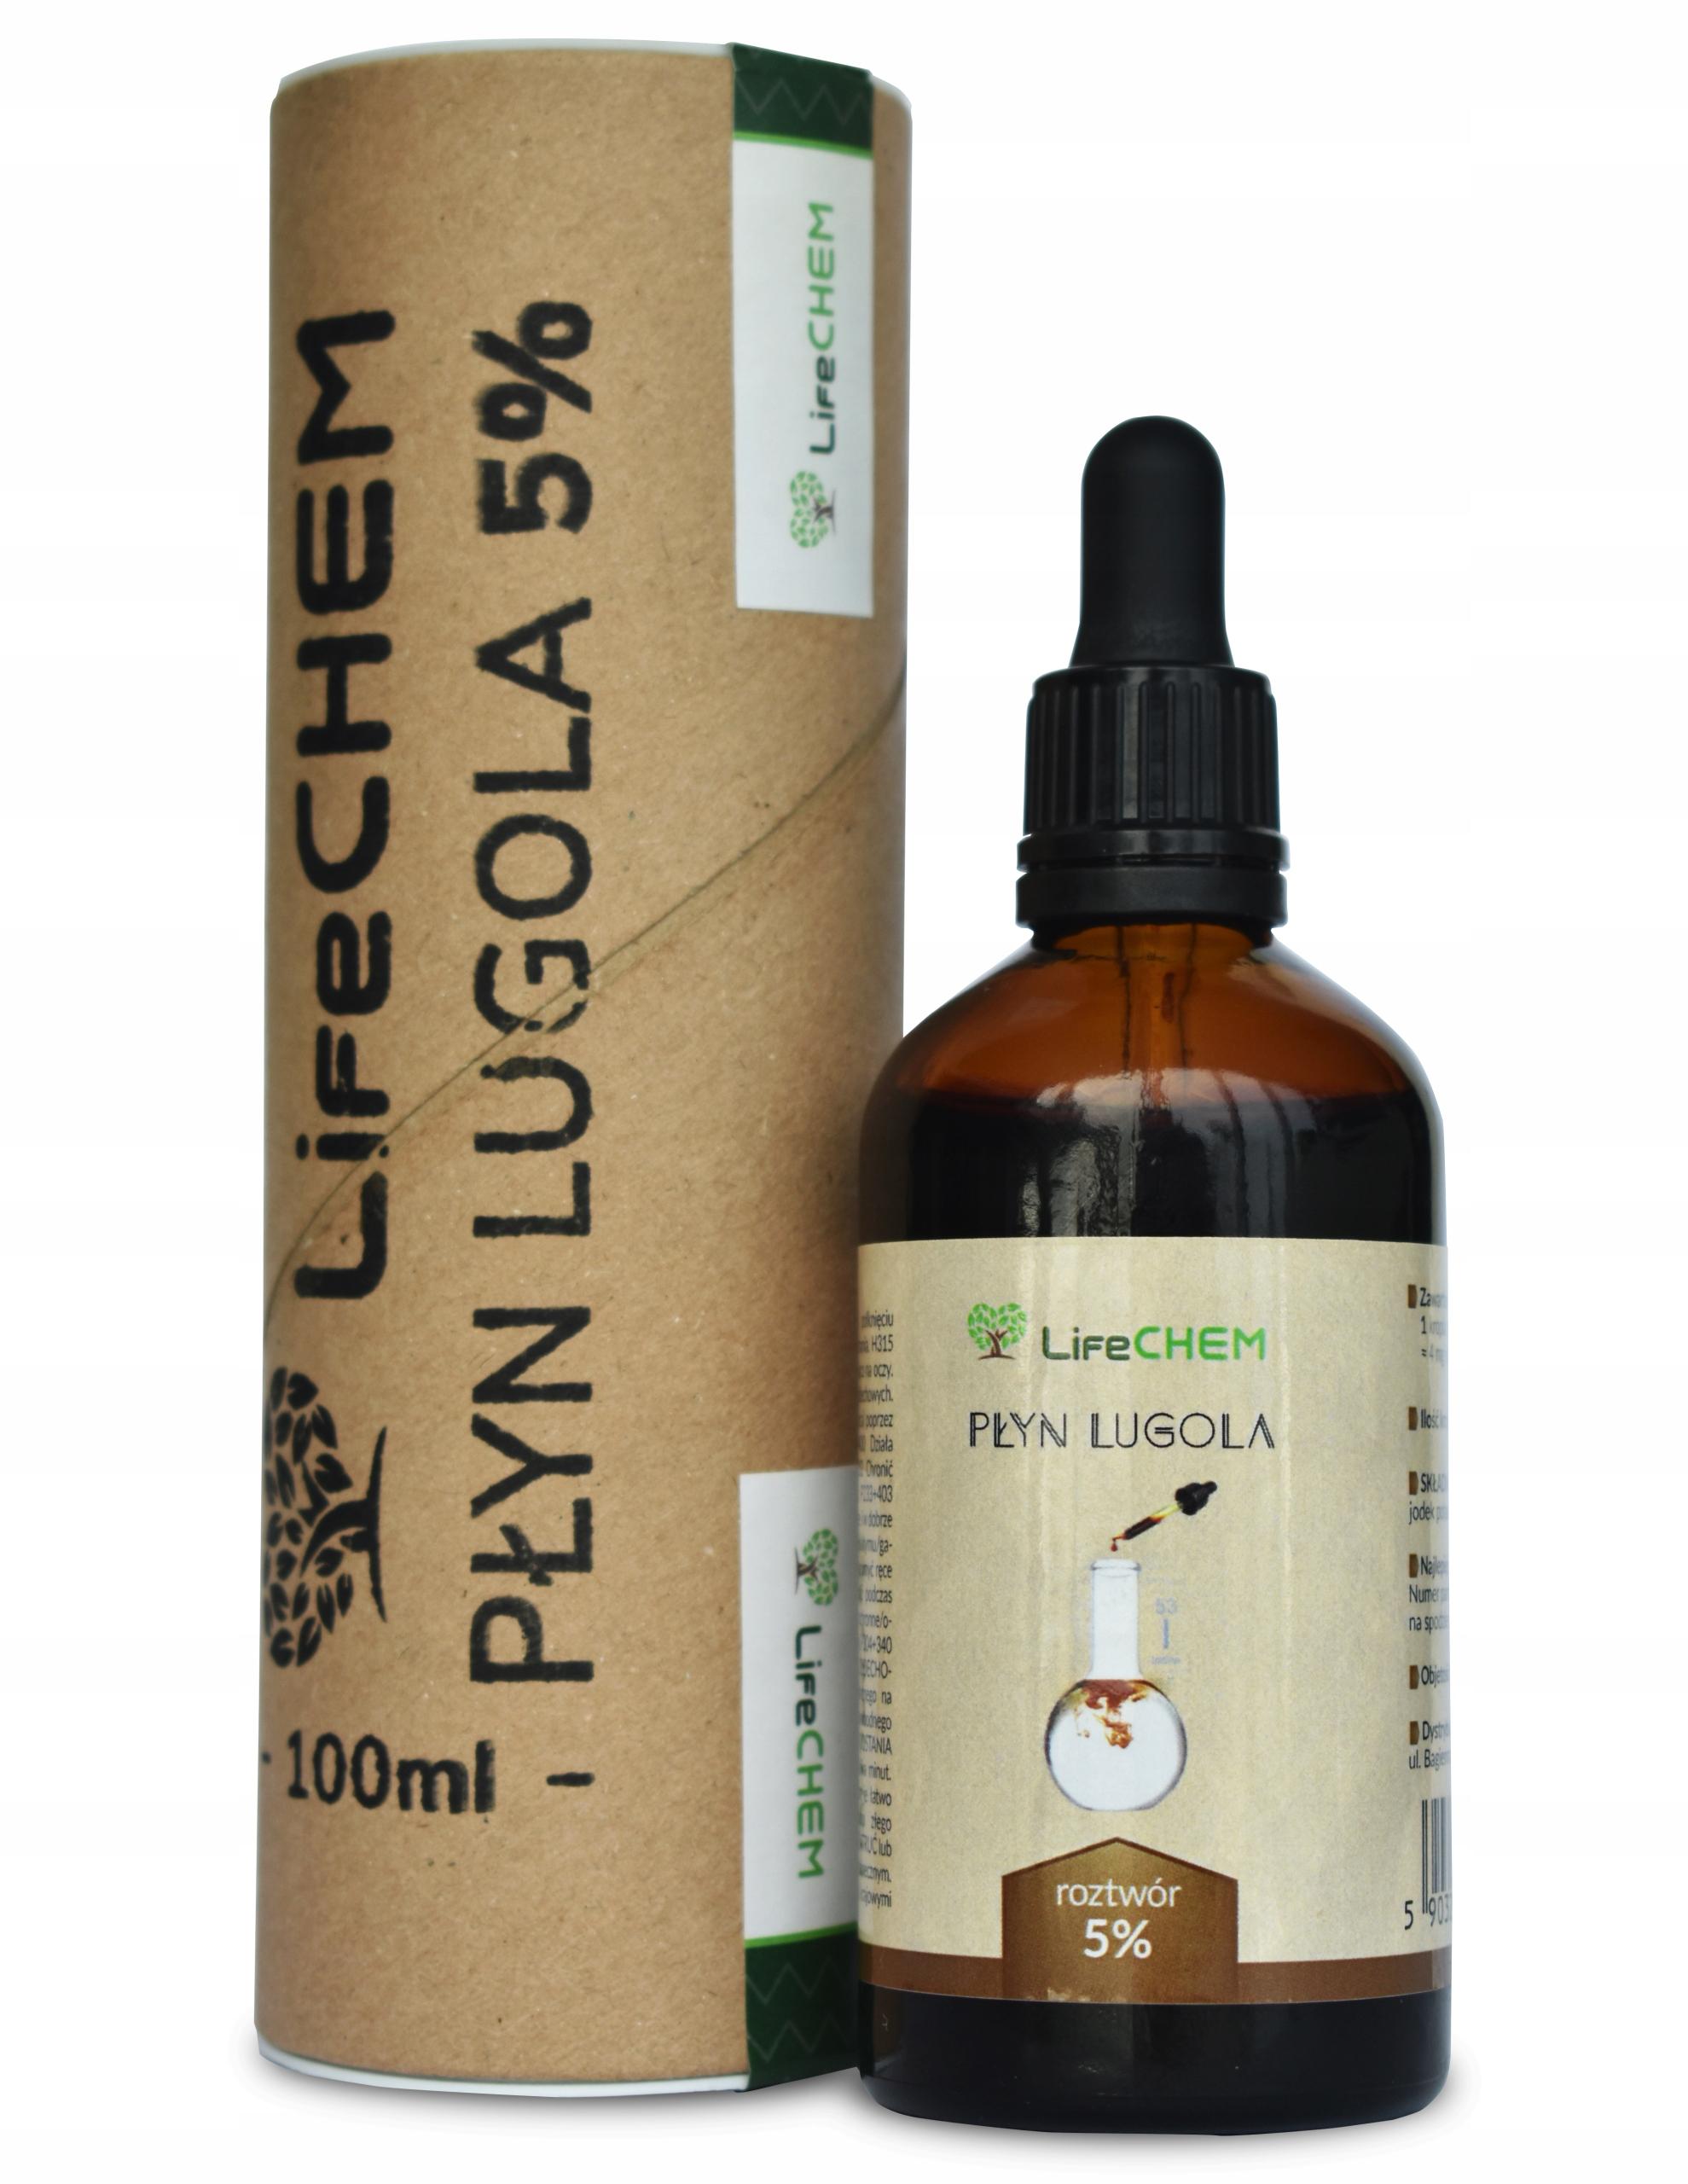 Item The liquid Lugol's solution 5% 100 ml - IODINE Pure ar ar - LifeCHEM